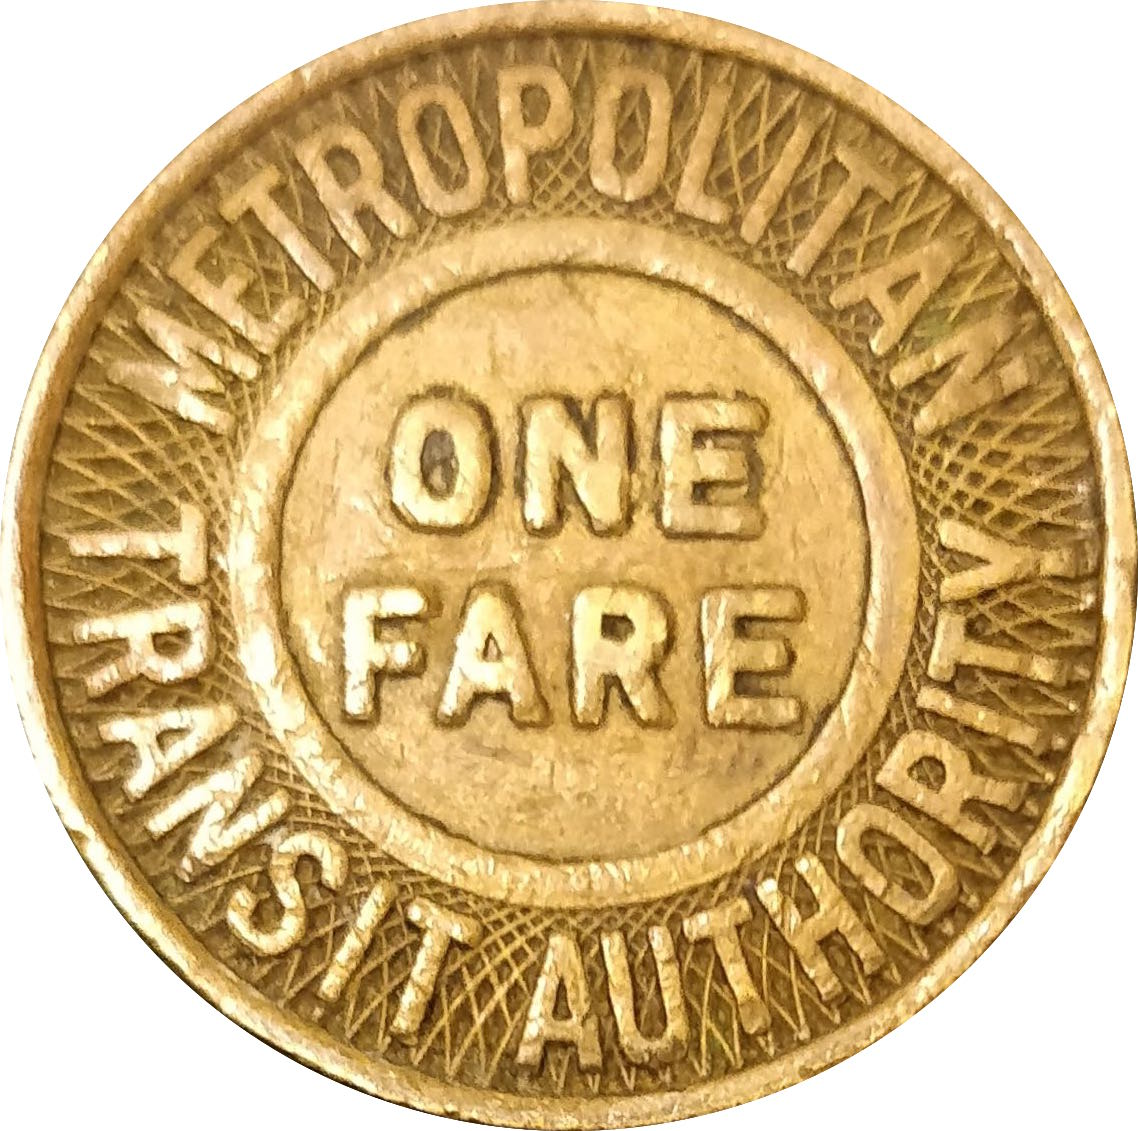 metropolitan transit authority one fare coin value